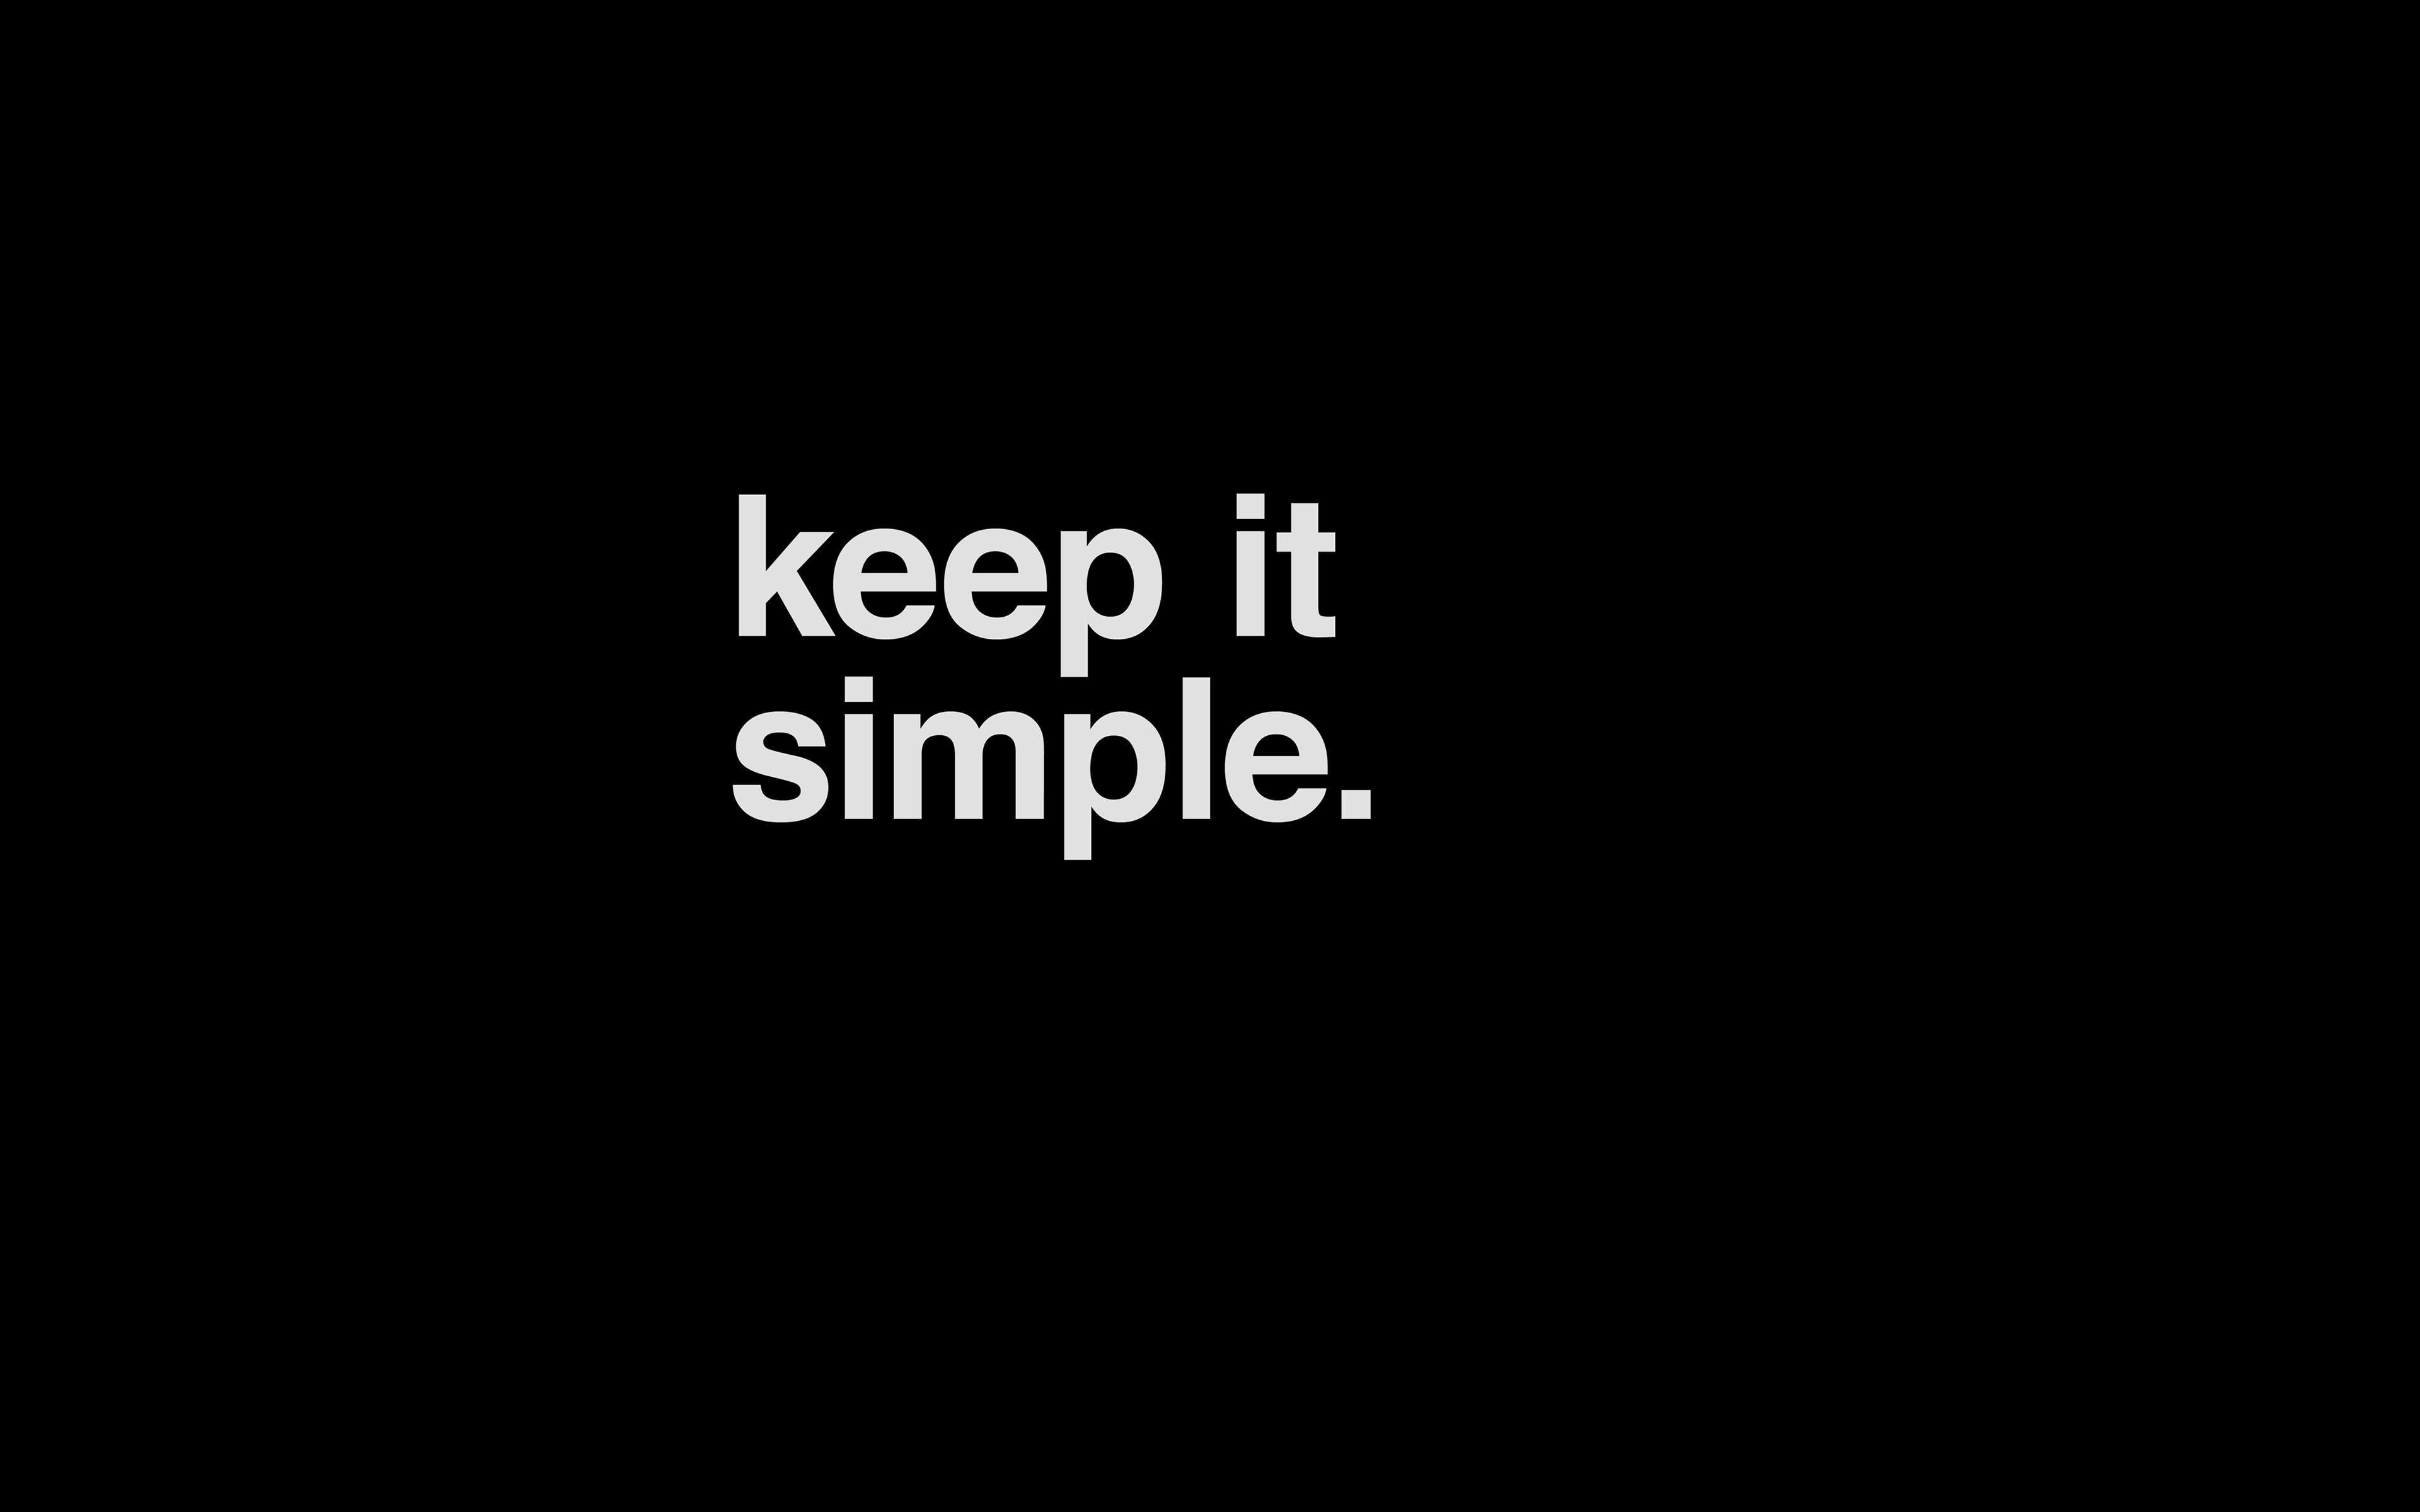 Minimal Keep It Simple Stupid Black Dark Quote 4k Wallpaper Hdwallpaper Desktop Text Wallpaper Desktop Wallpaper Quotes Wallpaper Dekstop